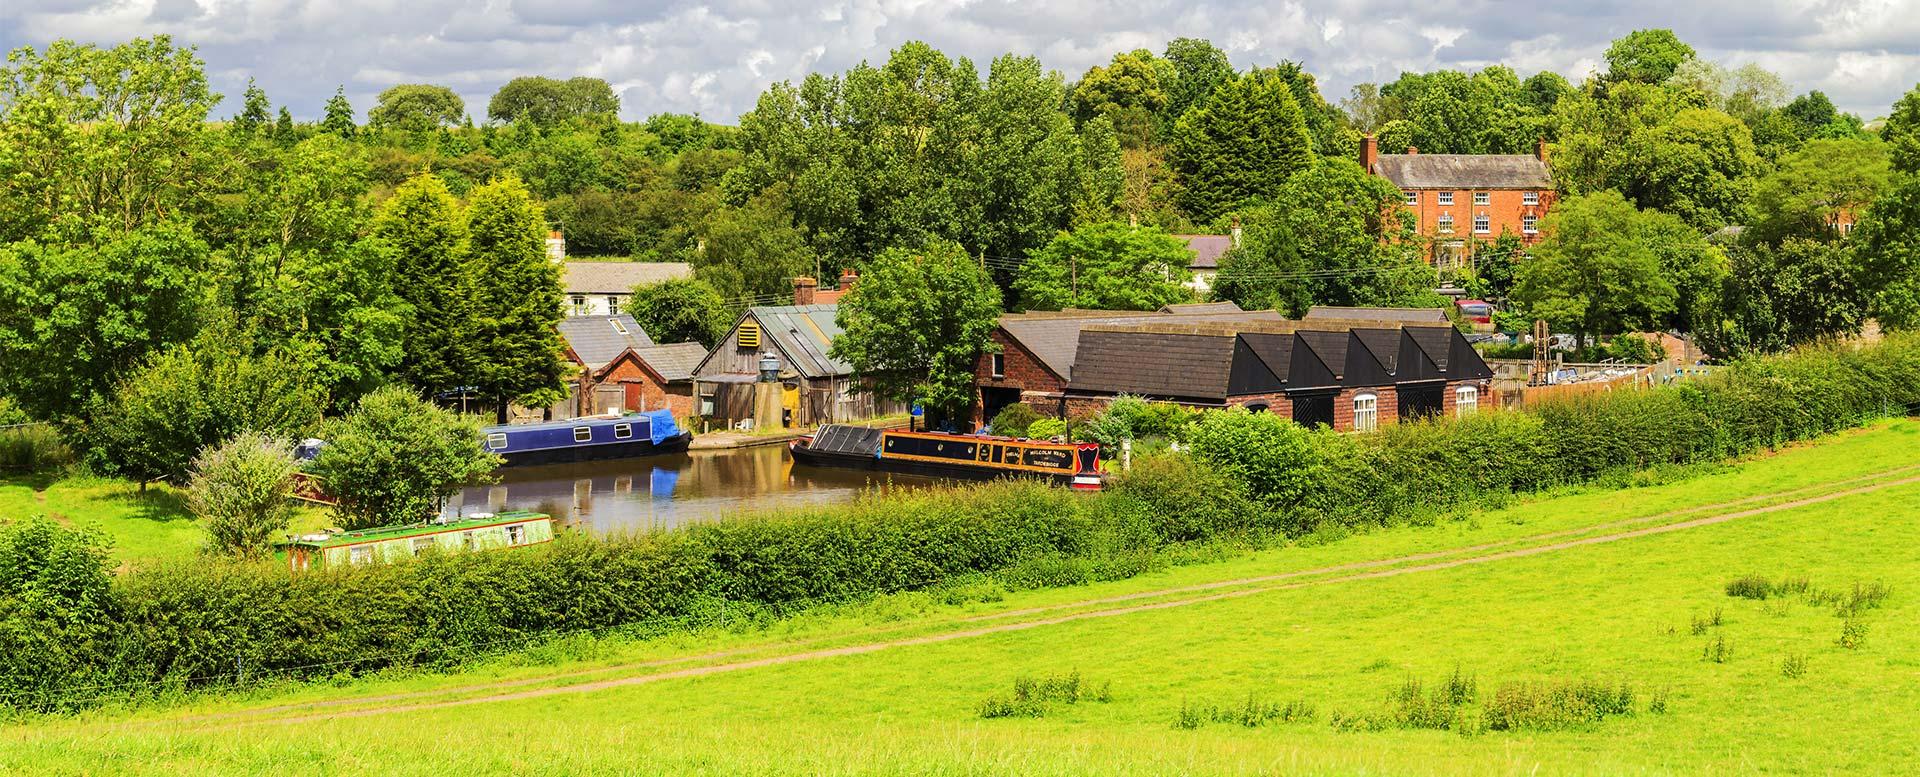 Hausboot Birmingham